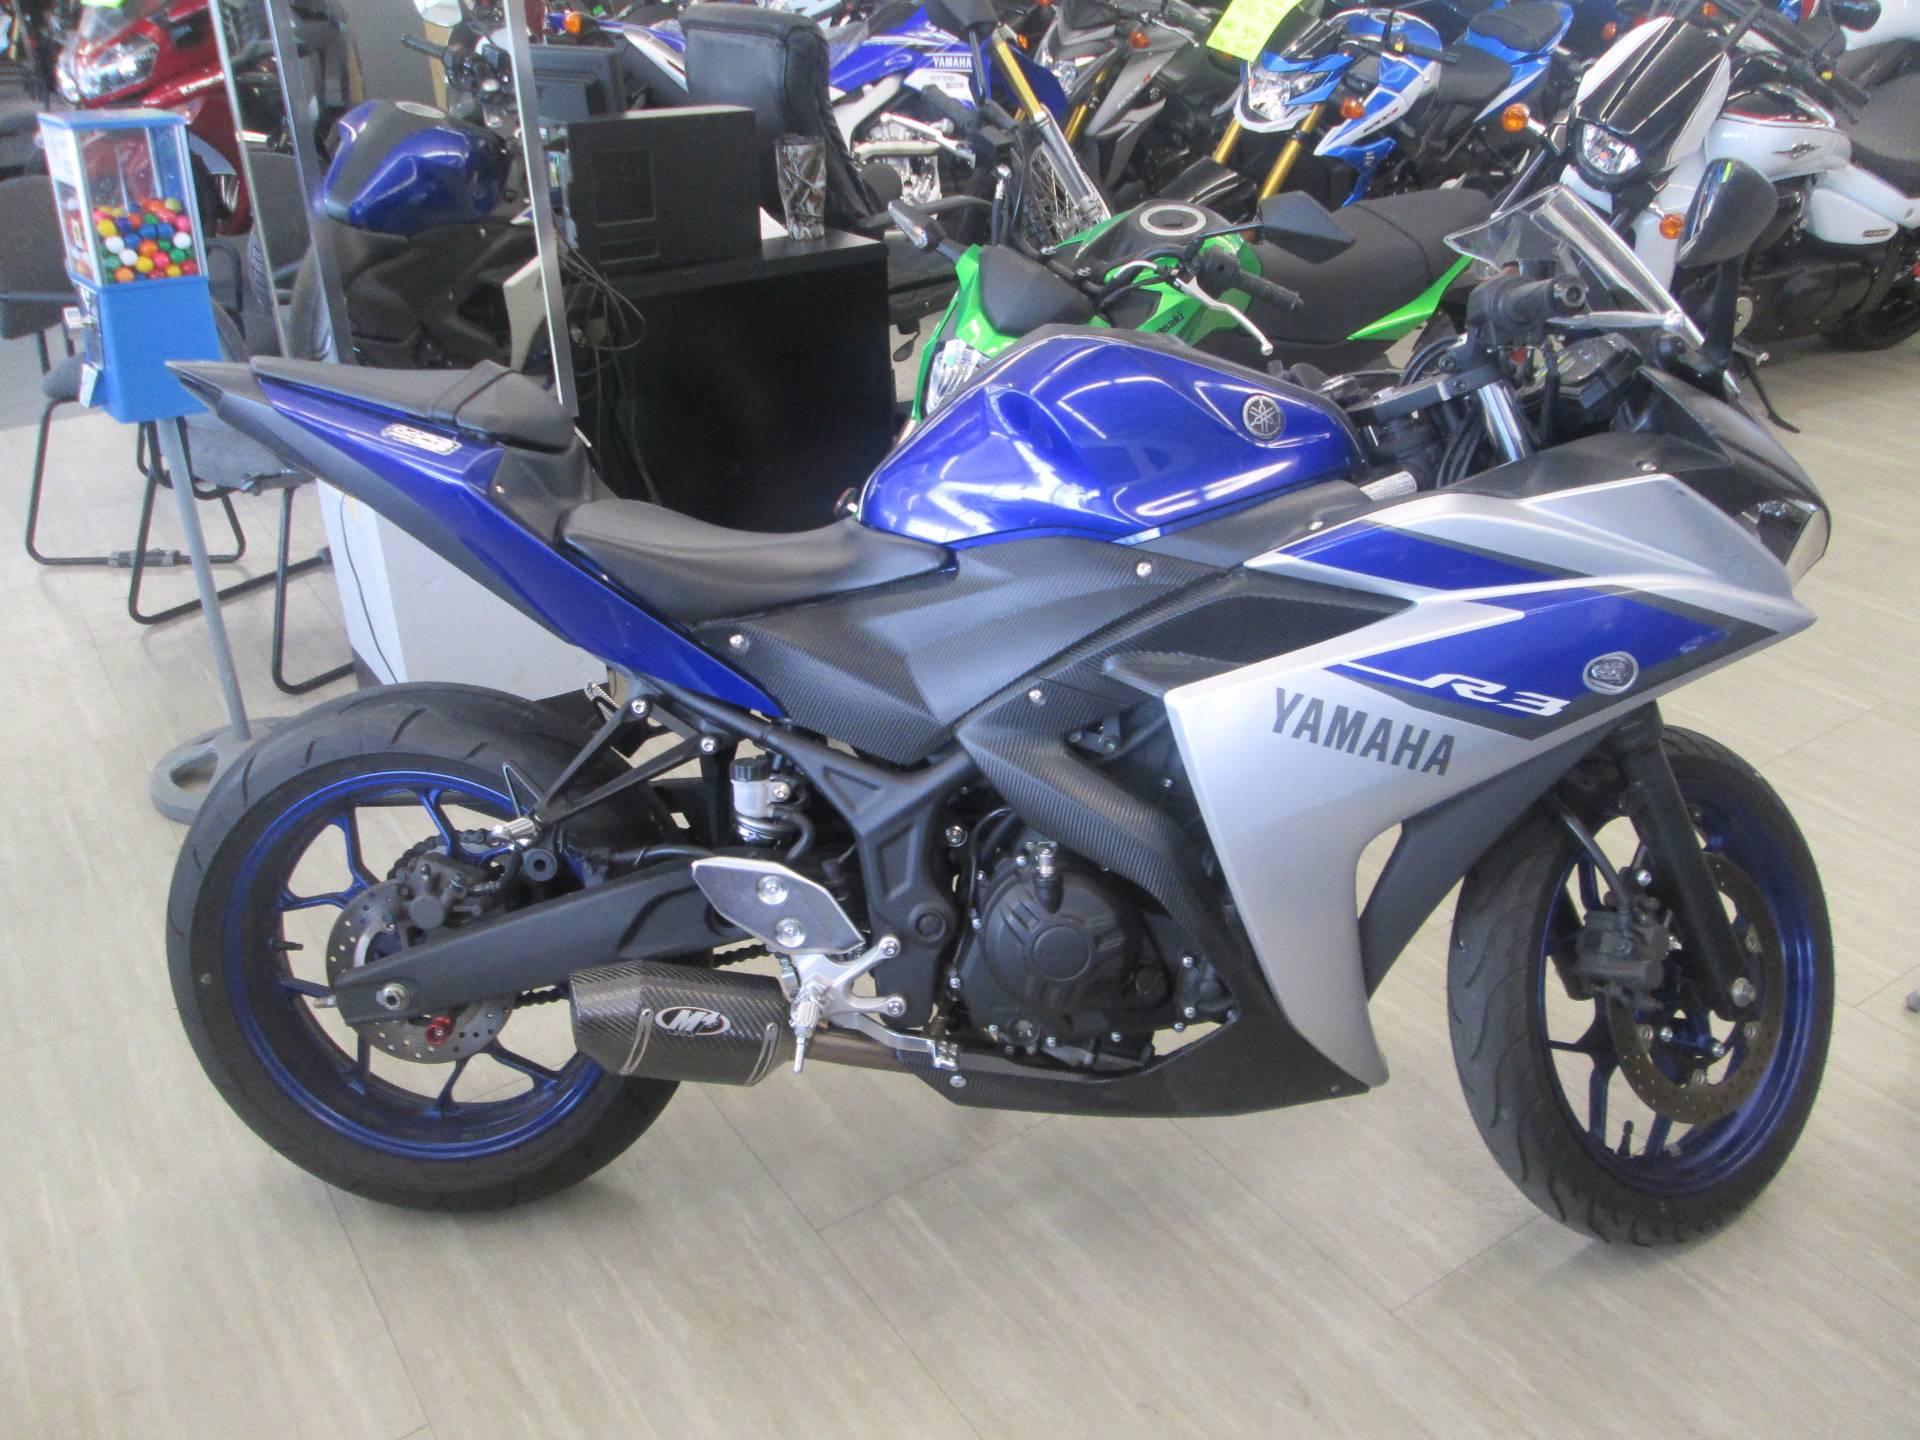 2015 Yamaha YZF-R3 in Dearborn Heights, Michigan